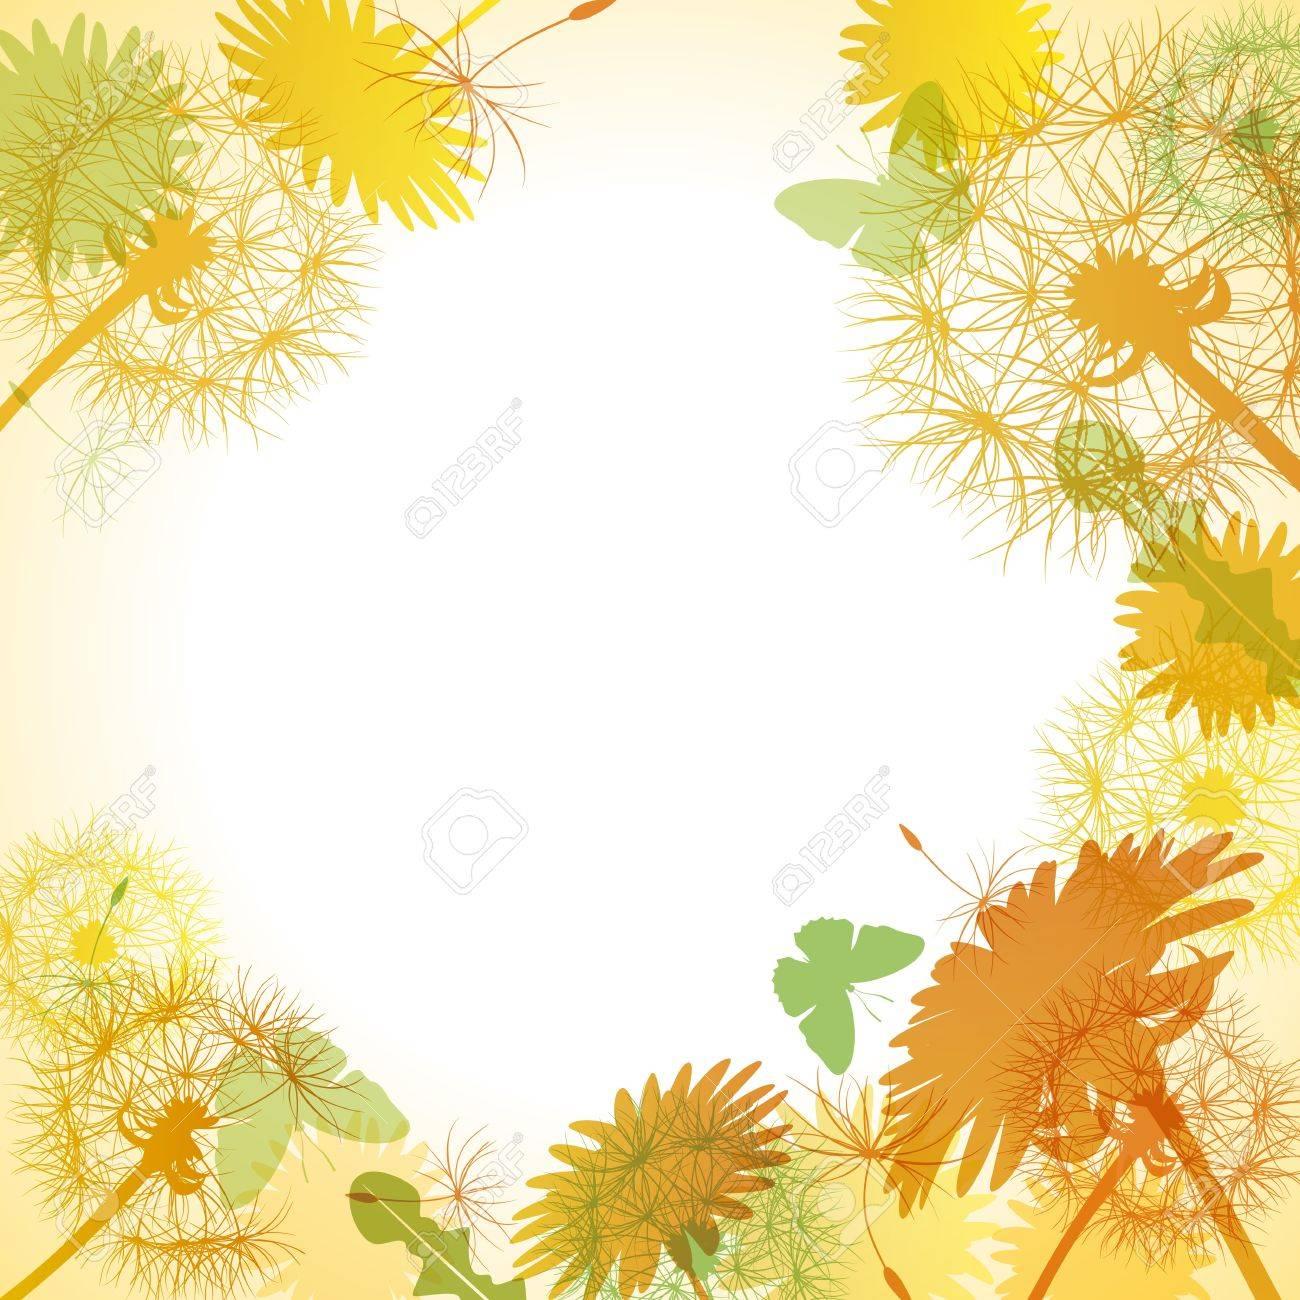 Dandelion yellow frame. Illustration vector. Stock Vector - 12296751